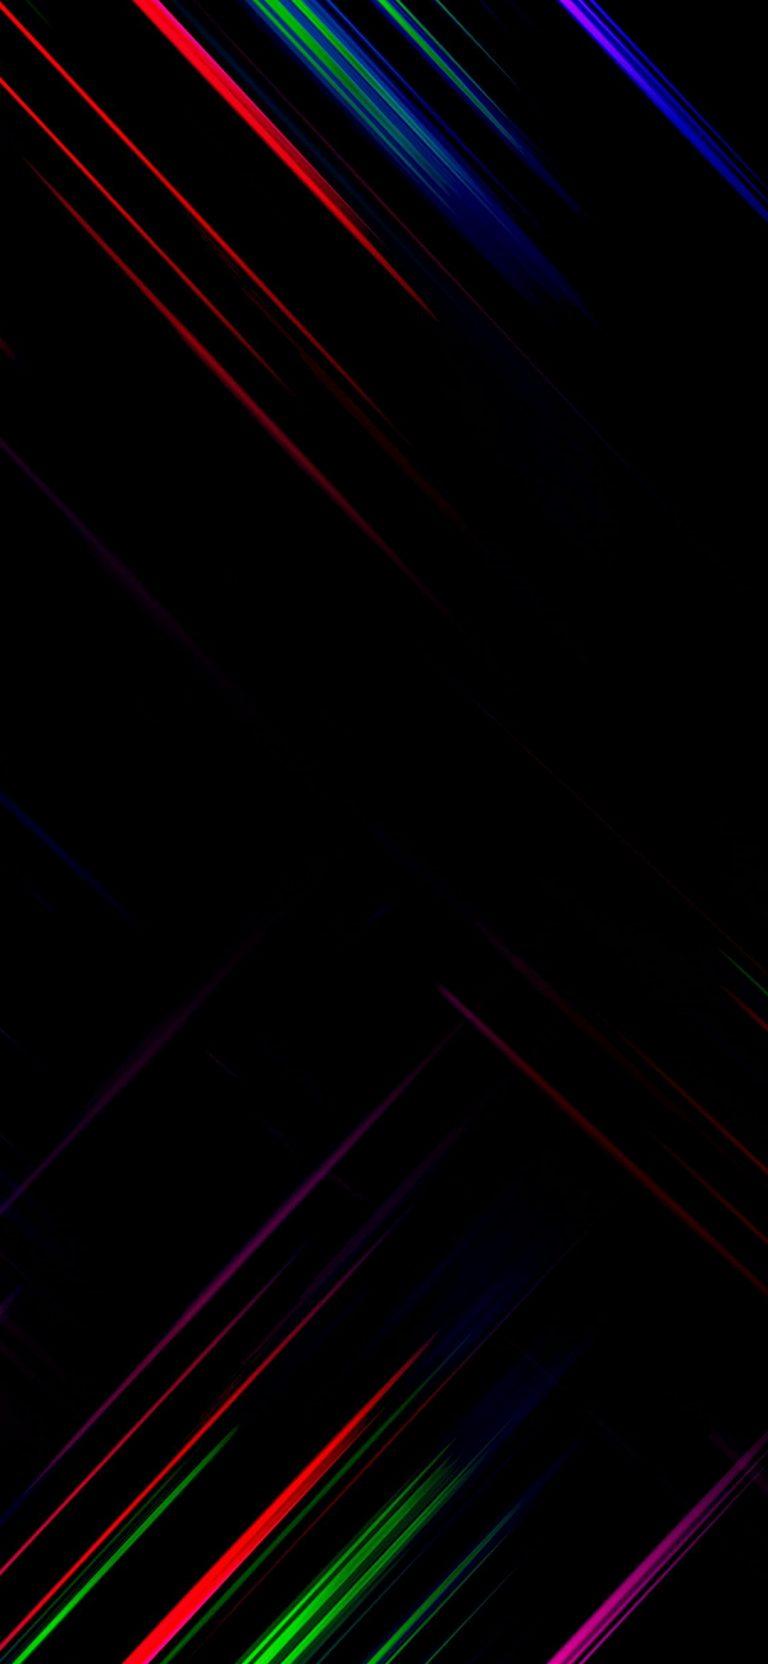 Amoled Phone Wallpaper 111 1080x2340 768x1664